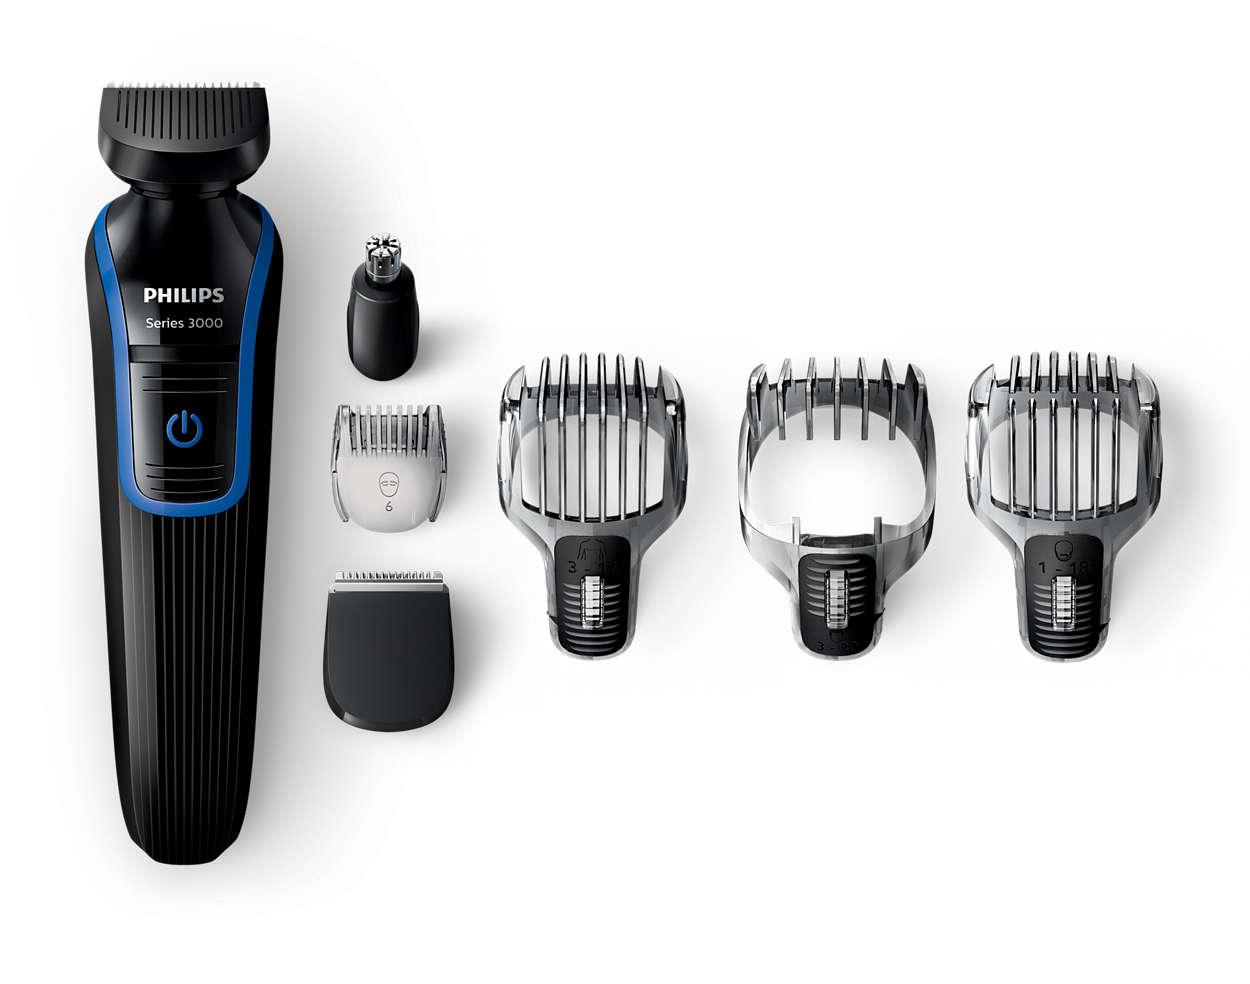 Aparador de pelos, cabelo e barba multifuncional